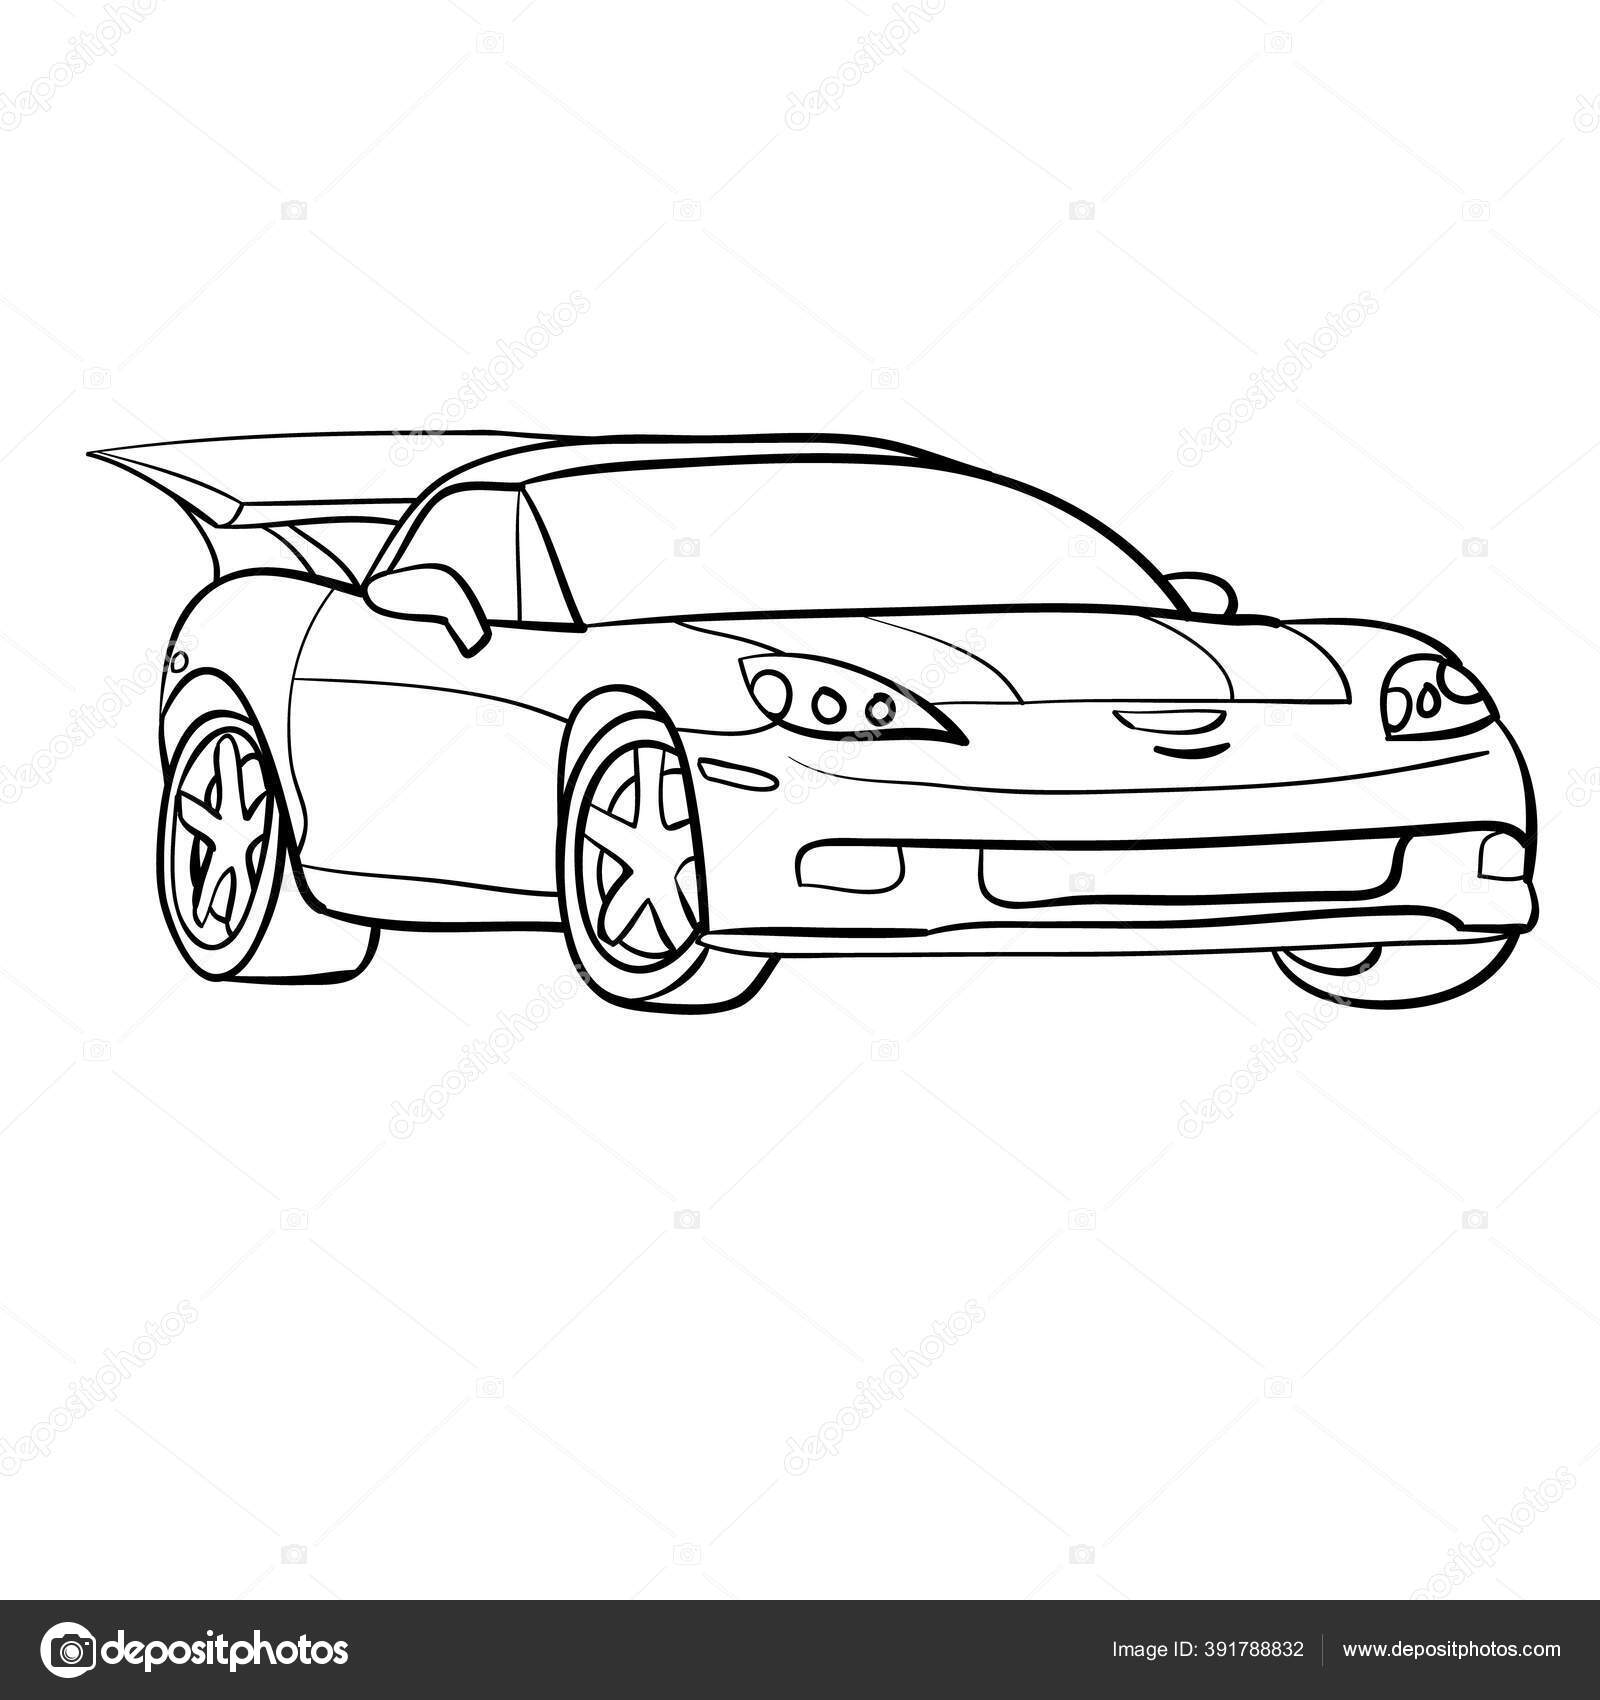 Sketsa Mobil Balap Kapal Buku Mewarnai Objek Terisolasi Latar Belakang Stok Vektor C Kopirin 391788832